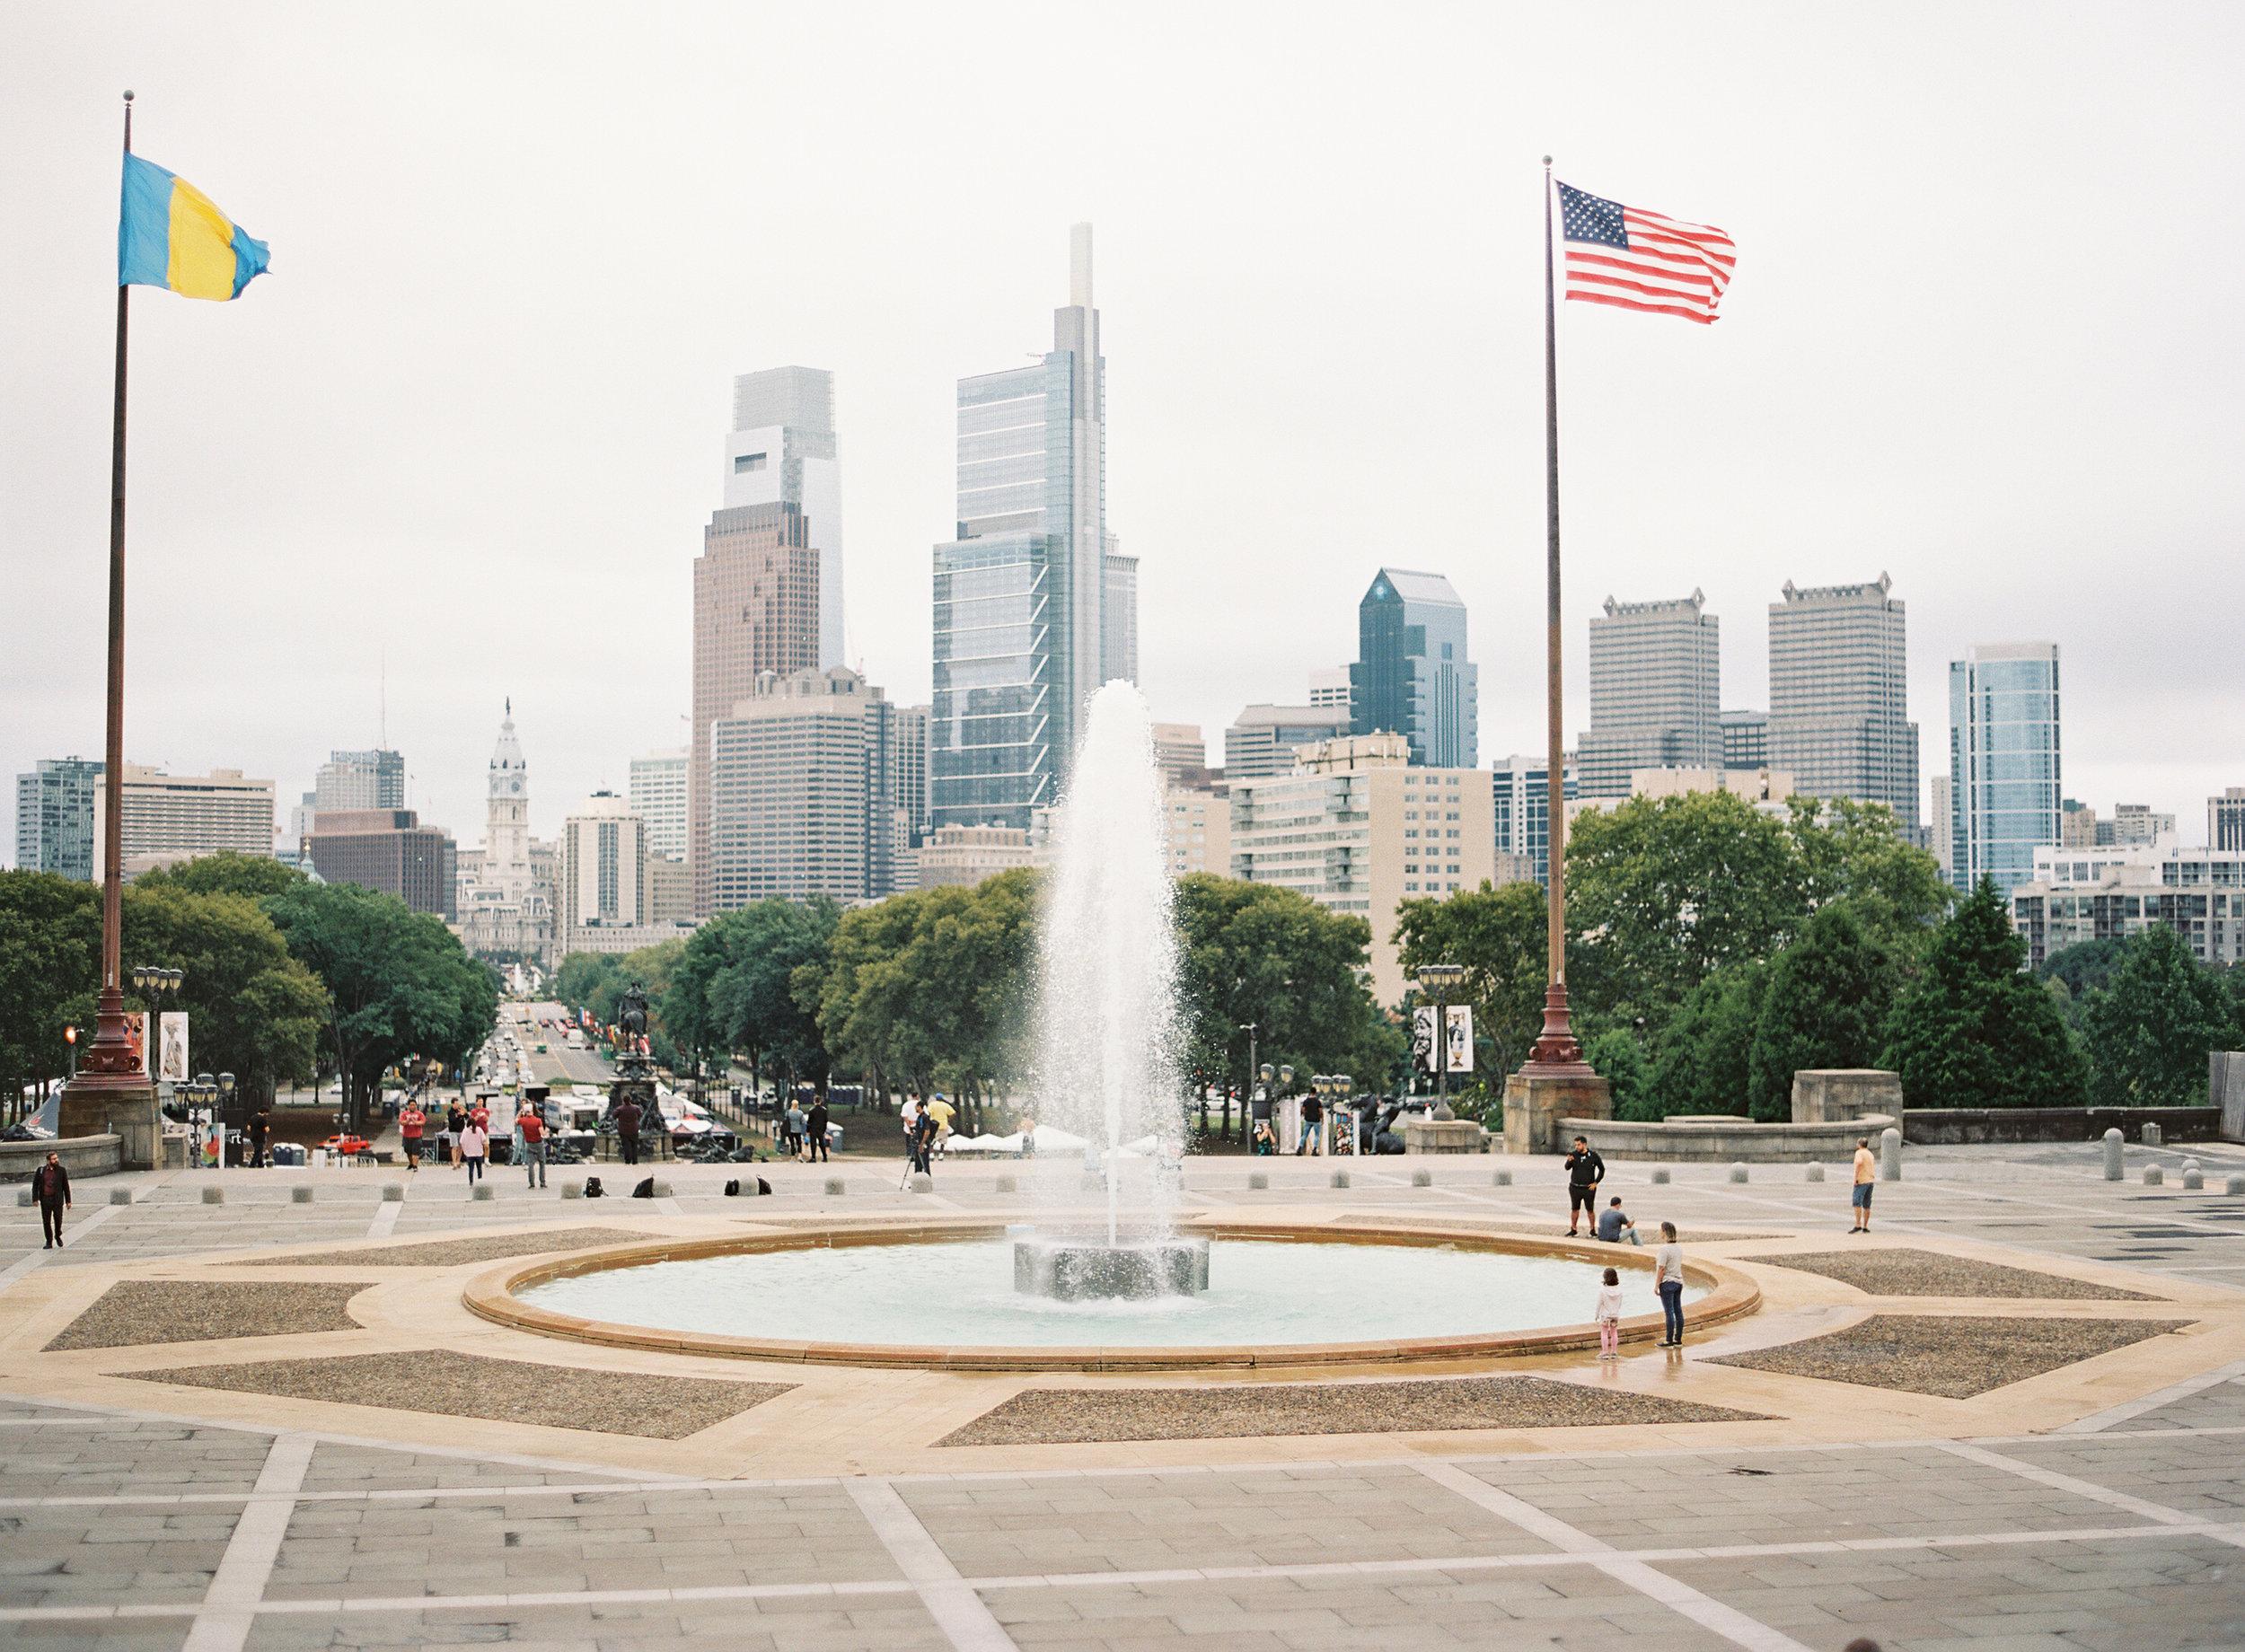 Philly-7.jpg